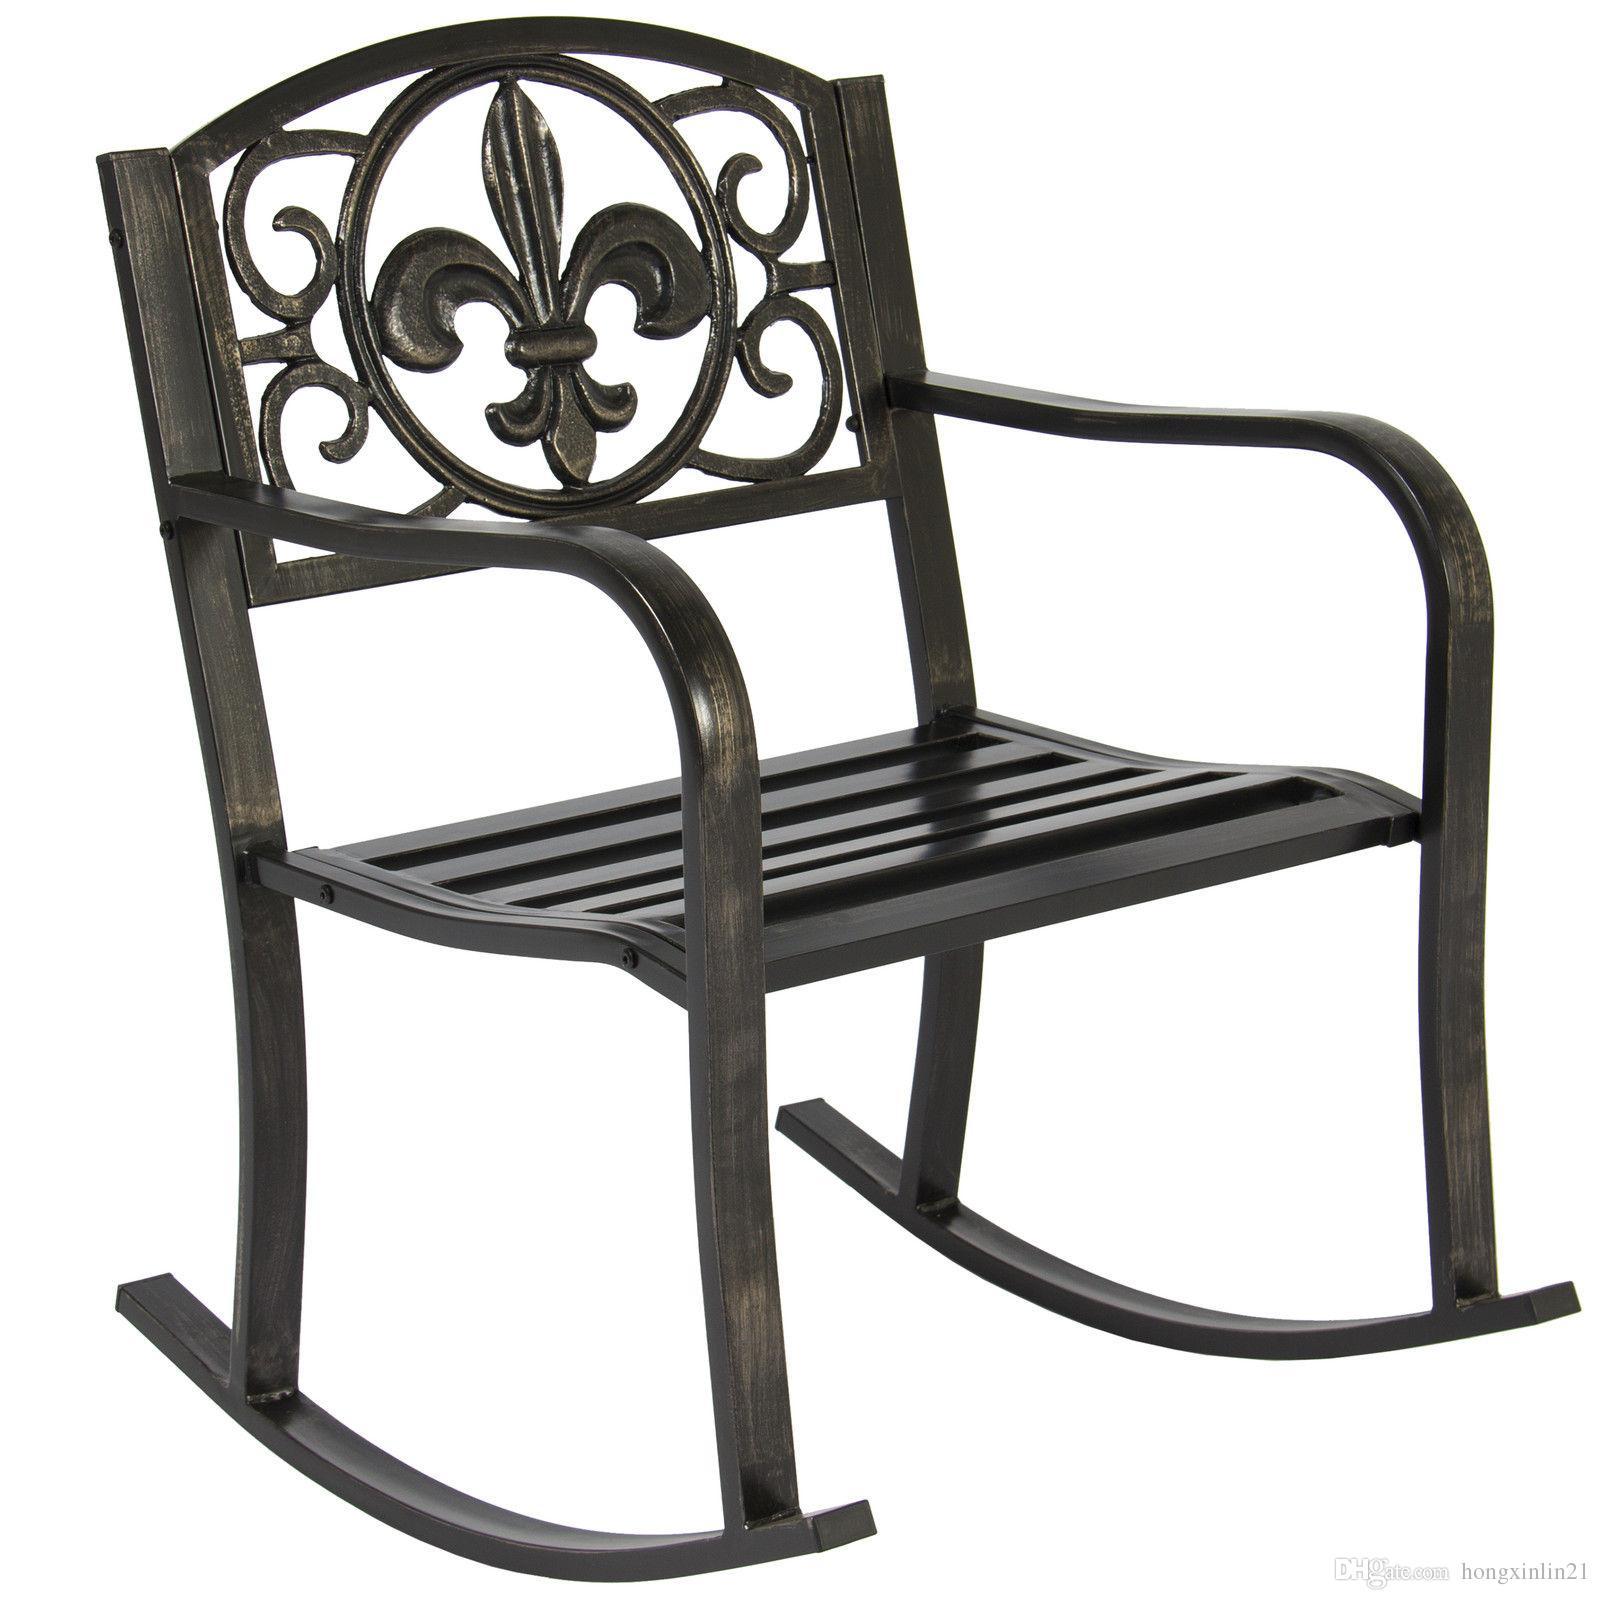 2018 Patio Metal Rocking Chair Porch Seat Deck Outdoor Backyard Glider Rocker From Hongxinlin21 56 28 Dhgate Com